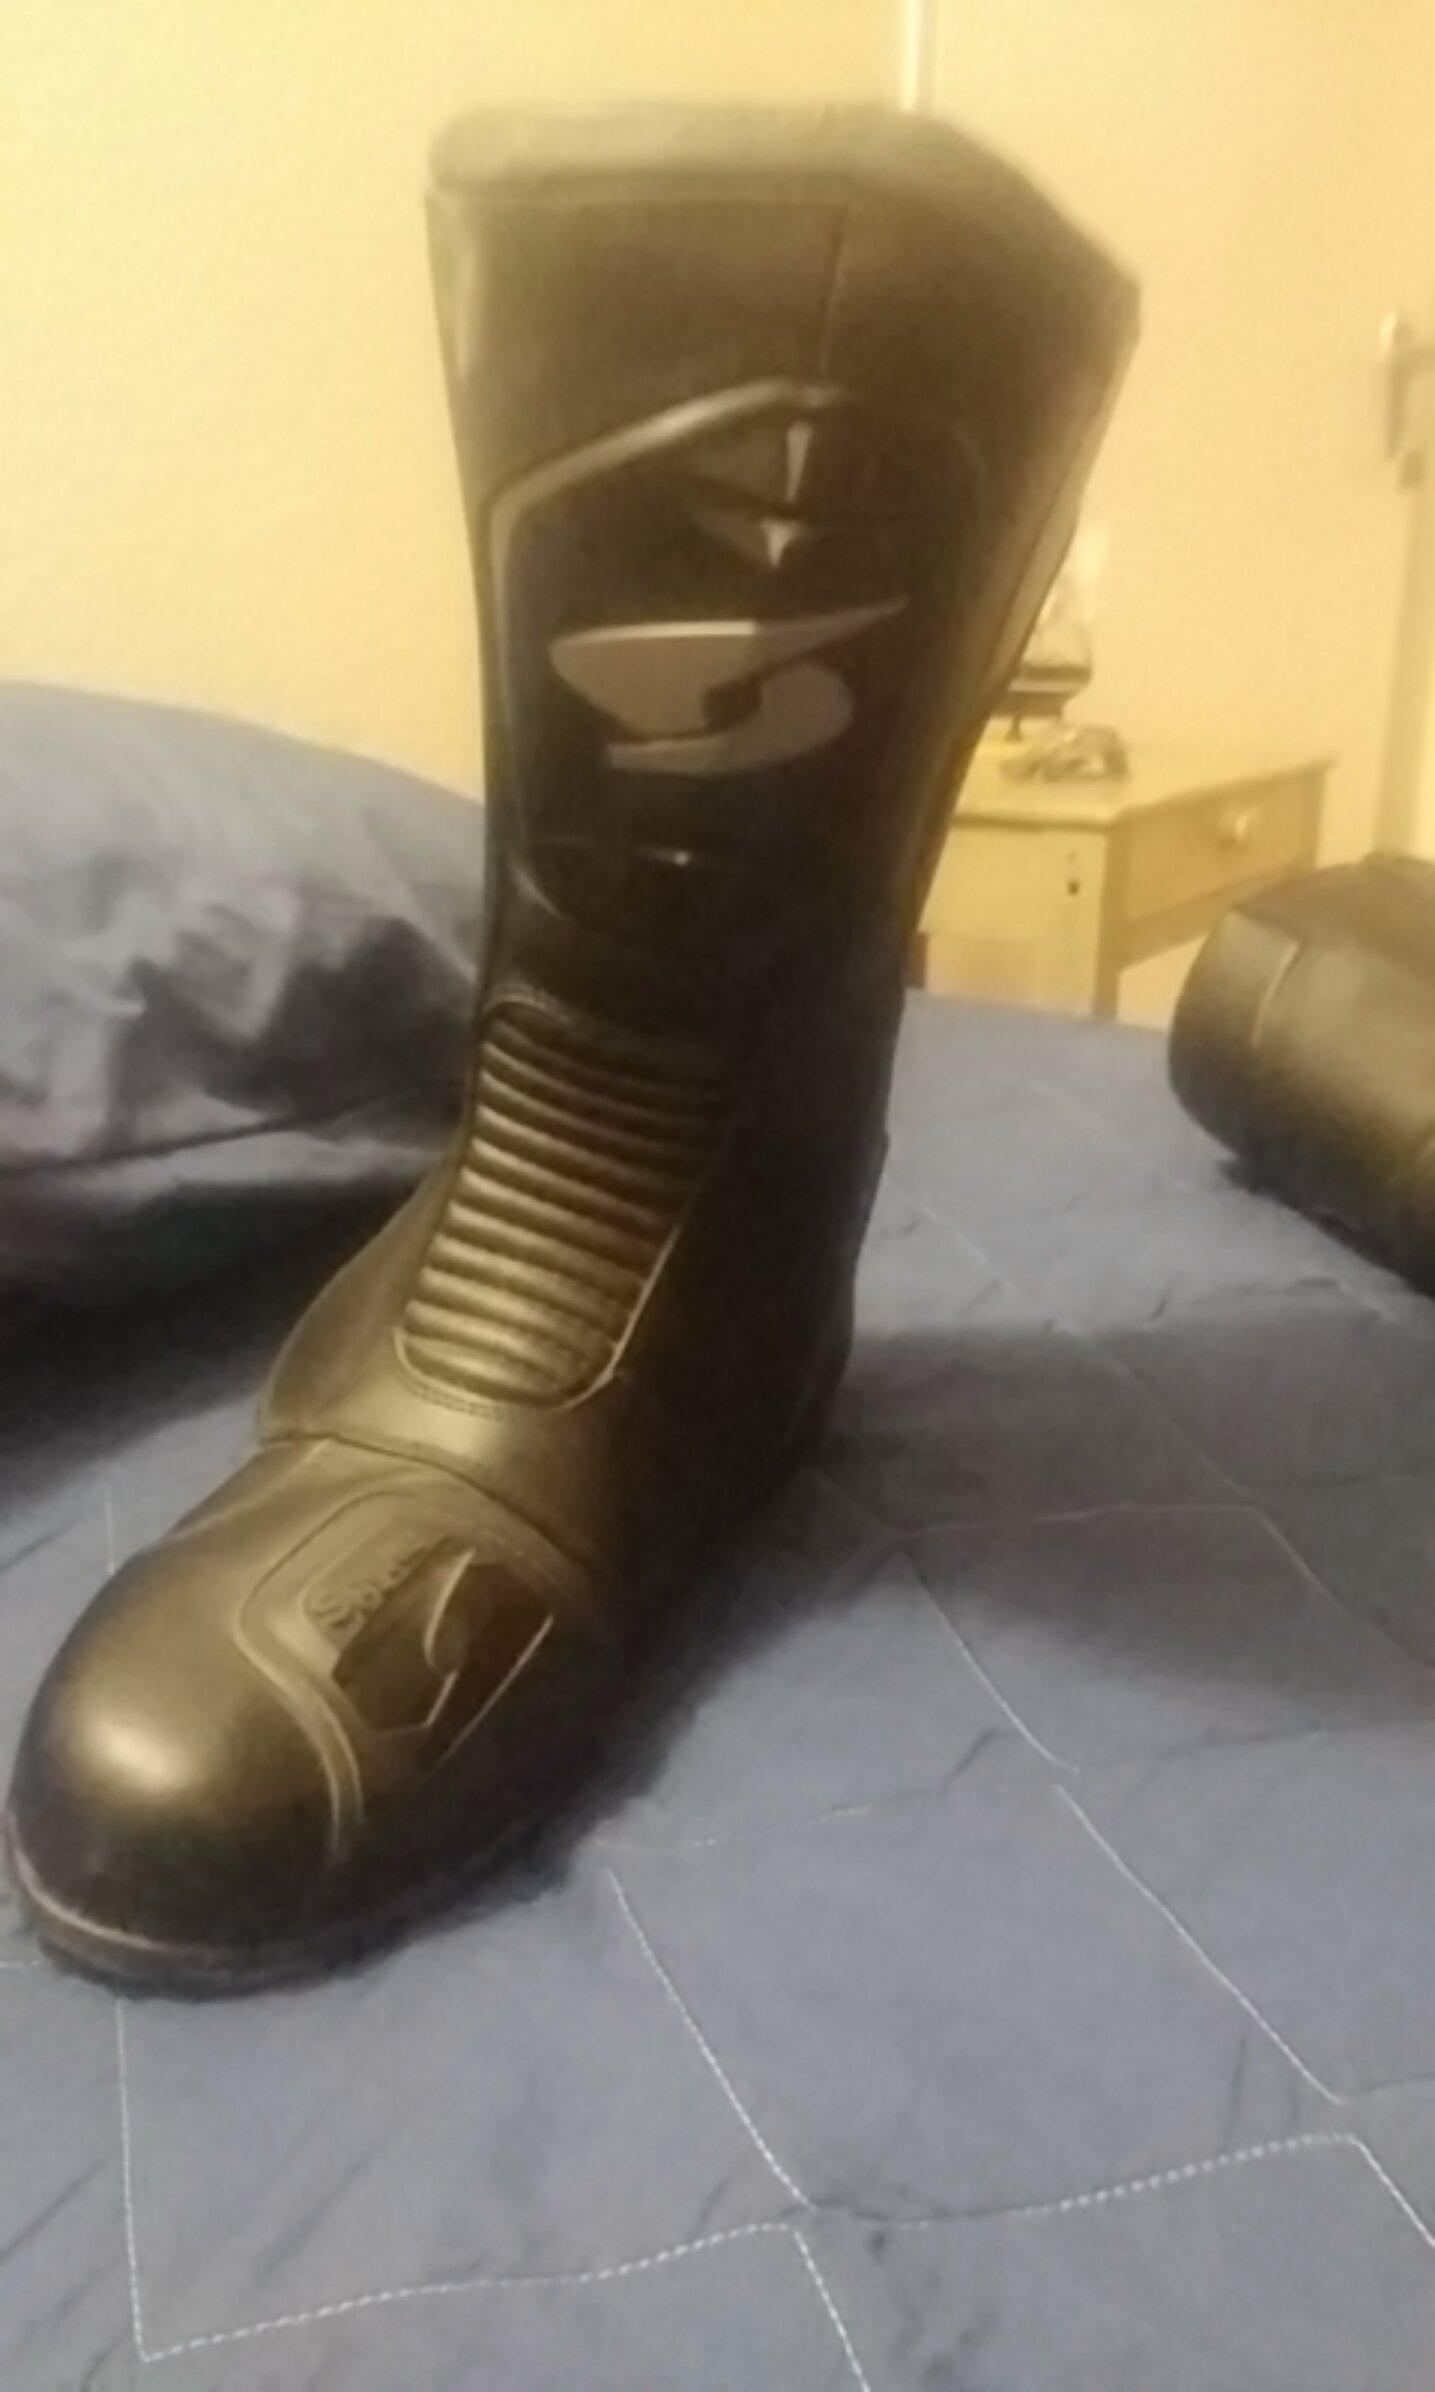 Bike boots and pants